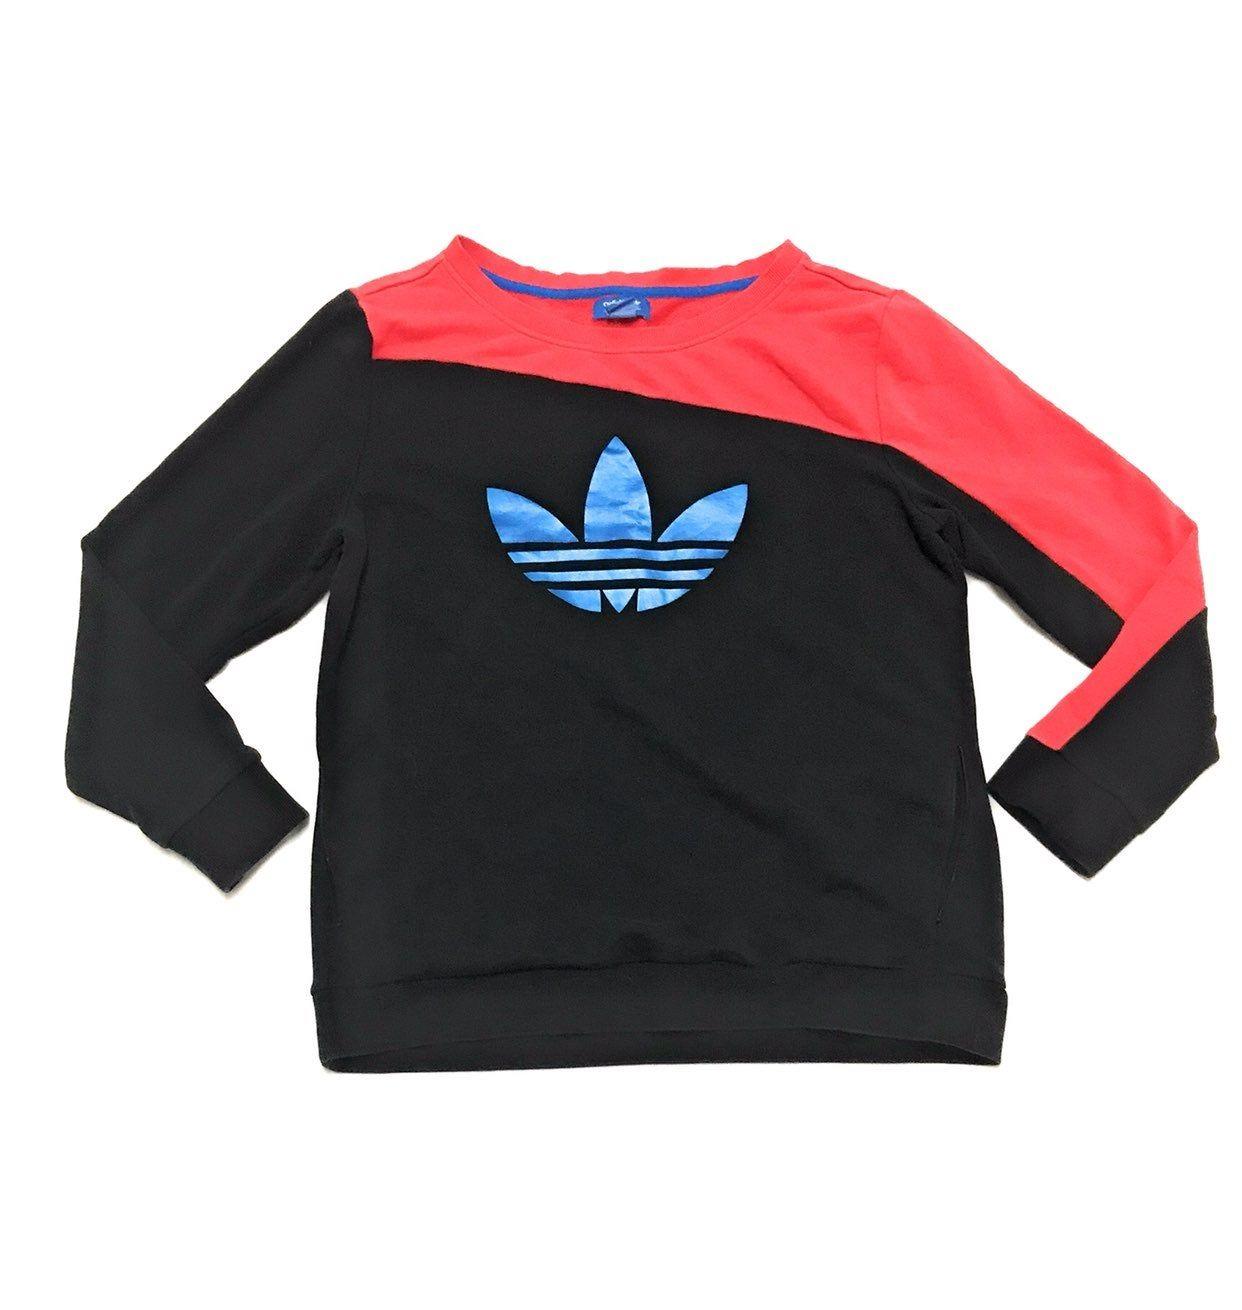 Adidas Trefoil Pink Black Sweatshirt Xl On Mercari Sweatshirts Black Sweatshirts Adidas Trefoil [ 1310 x 1242 Pixel ]